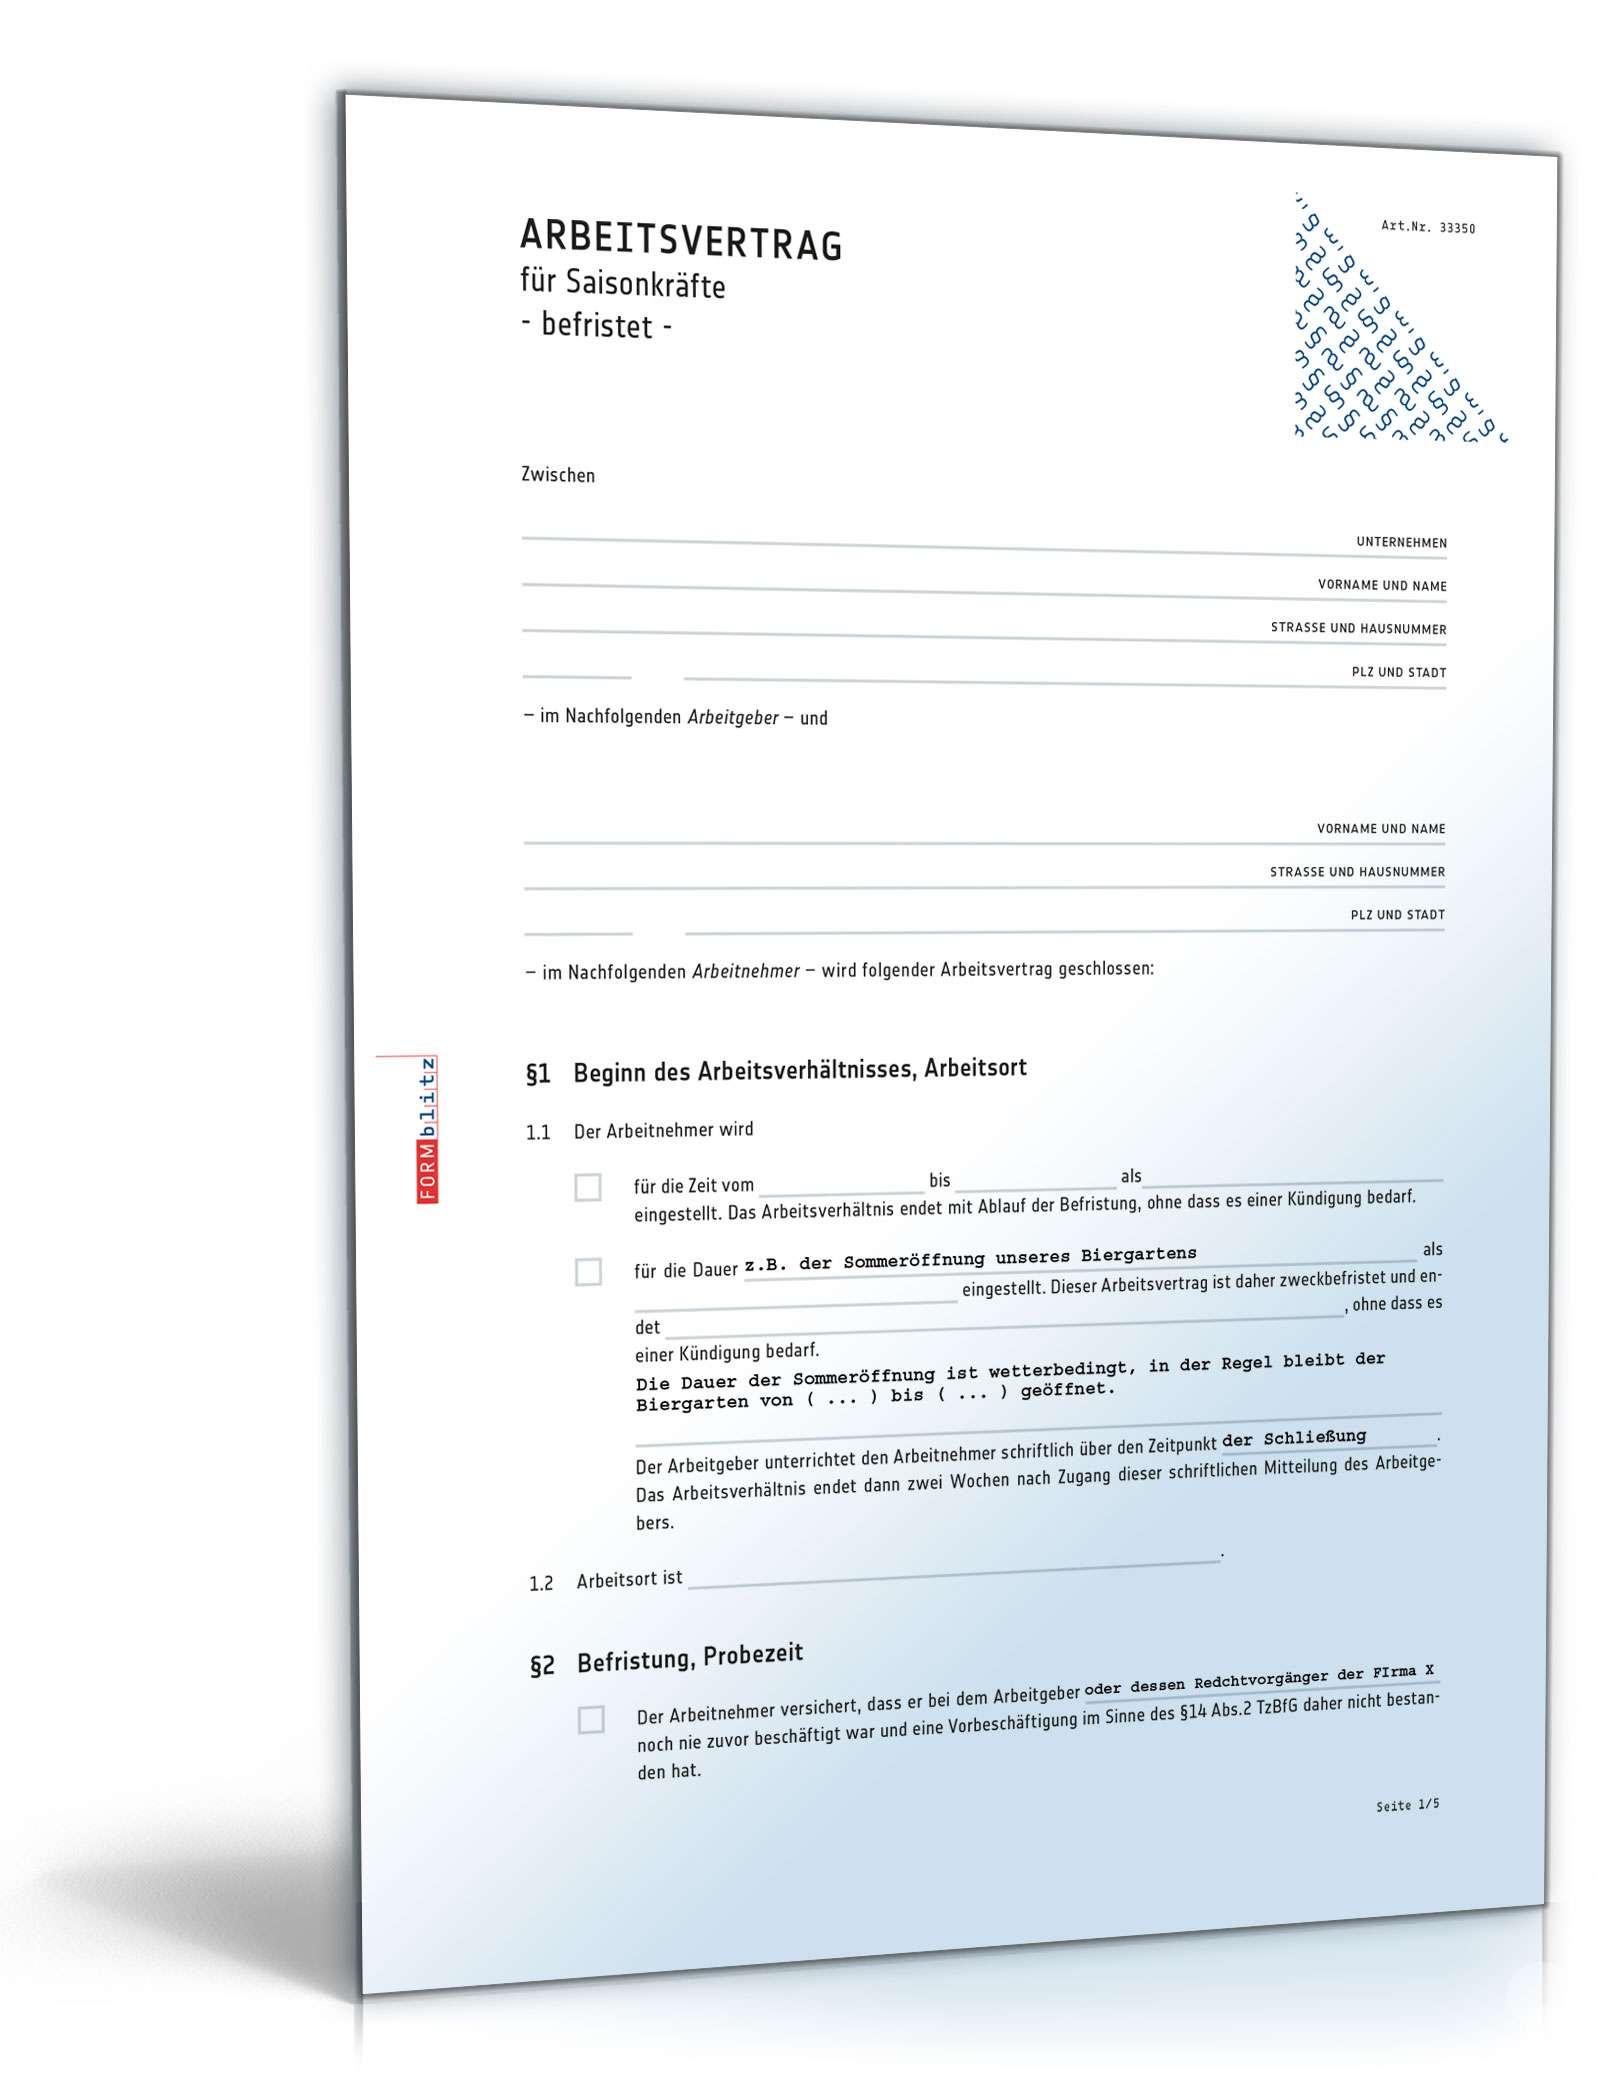 Arbeitsvertrag befristet Saisonkräfte | Muster zum Download